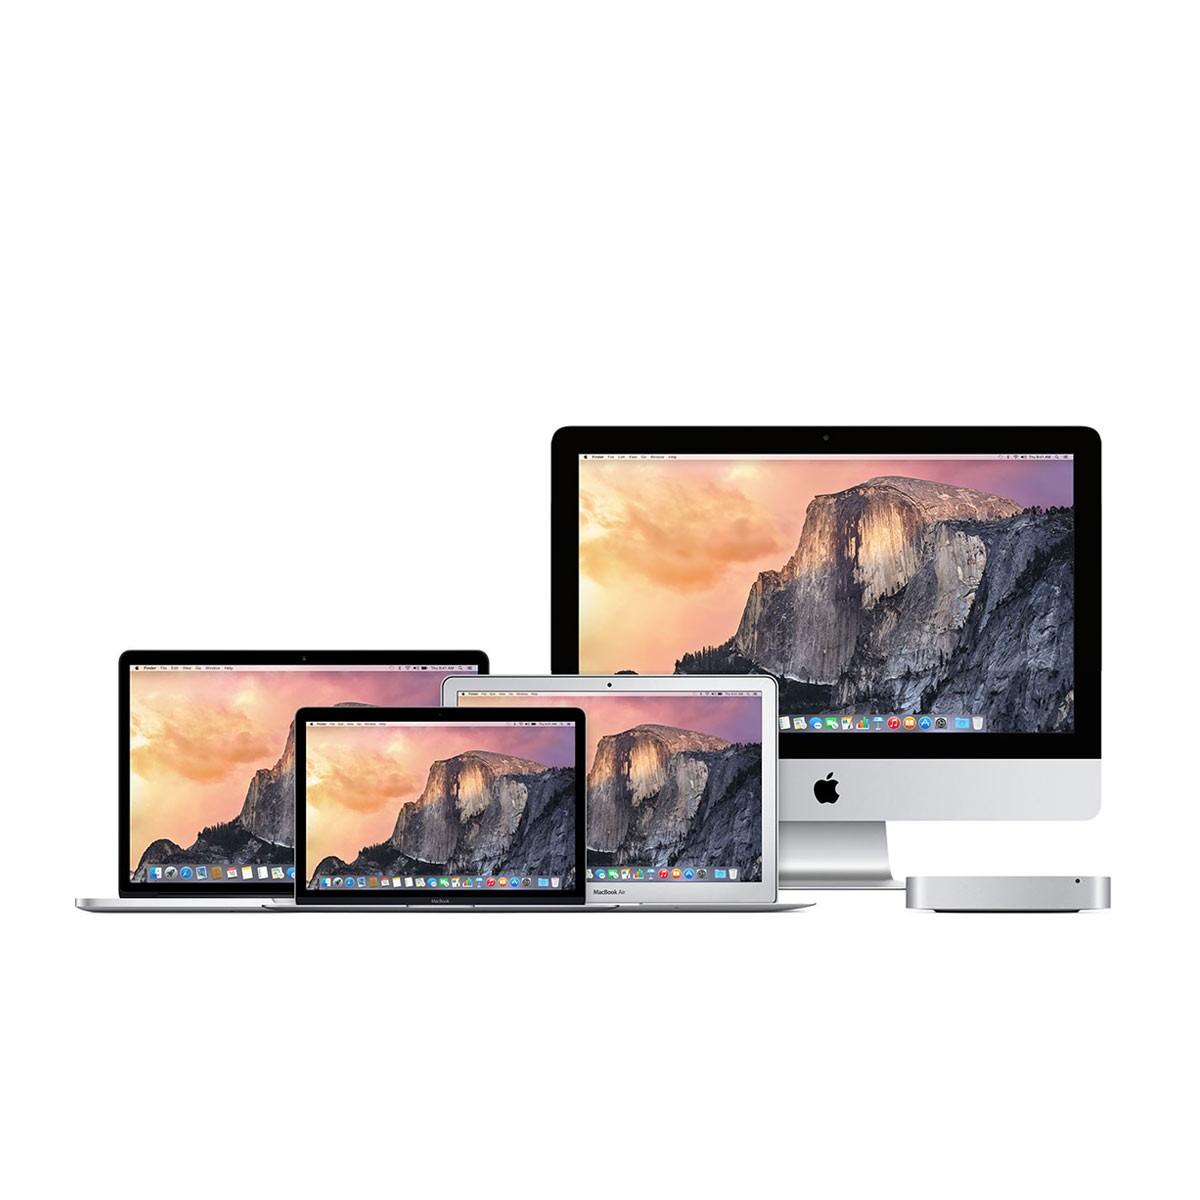 OS X használati alapok